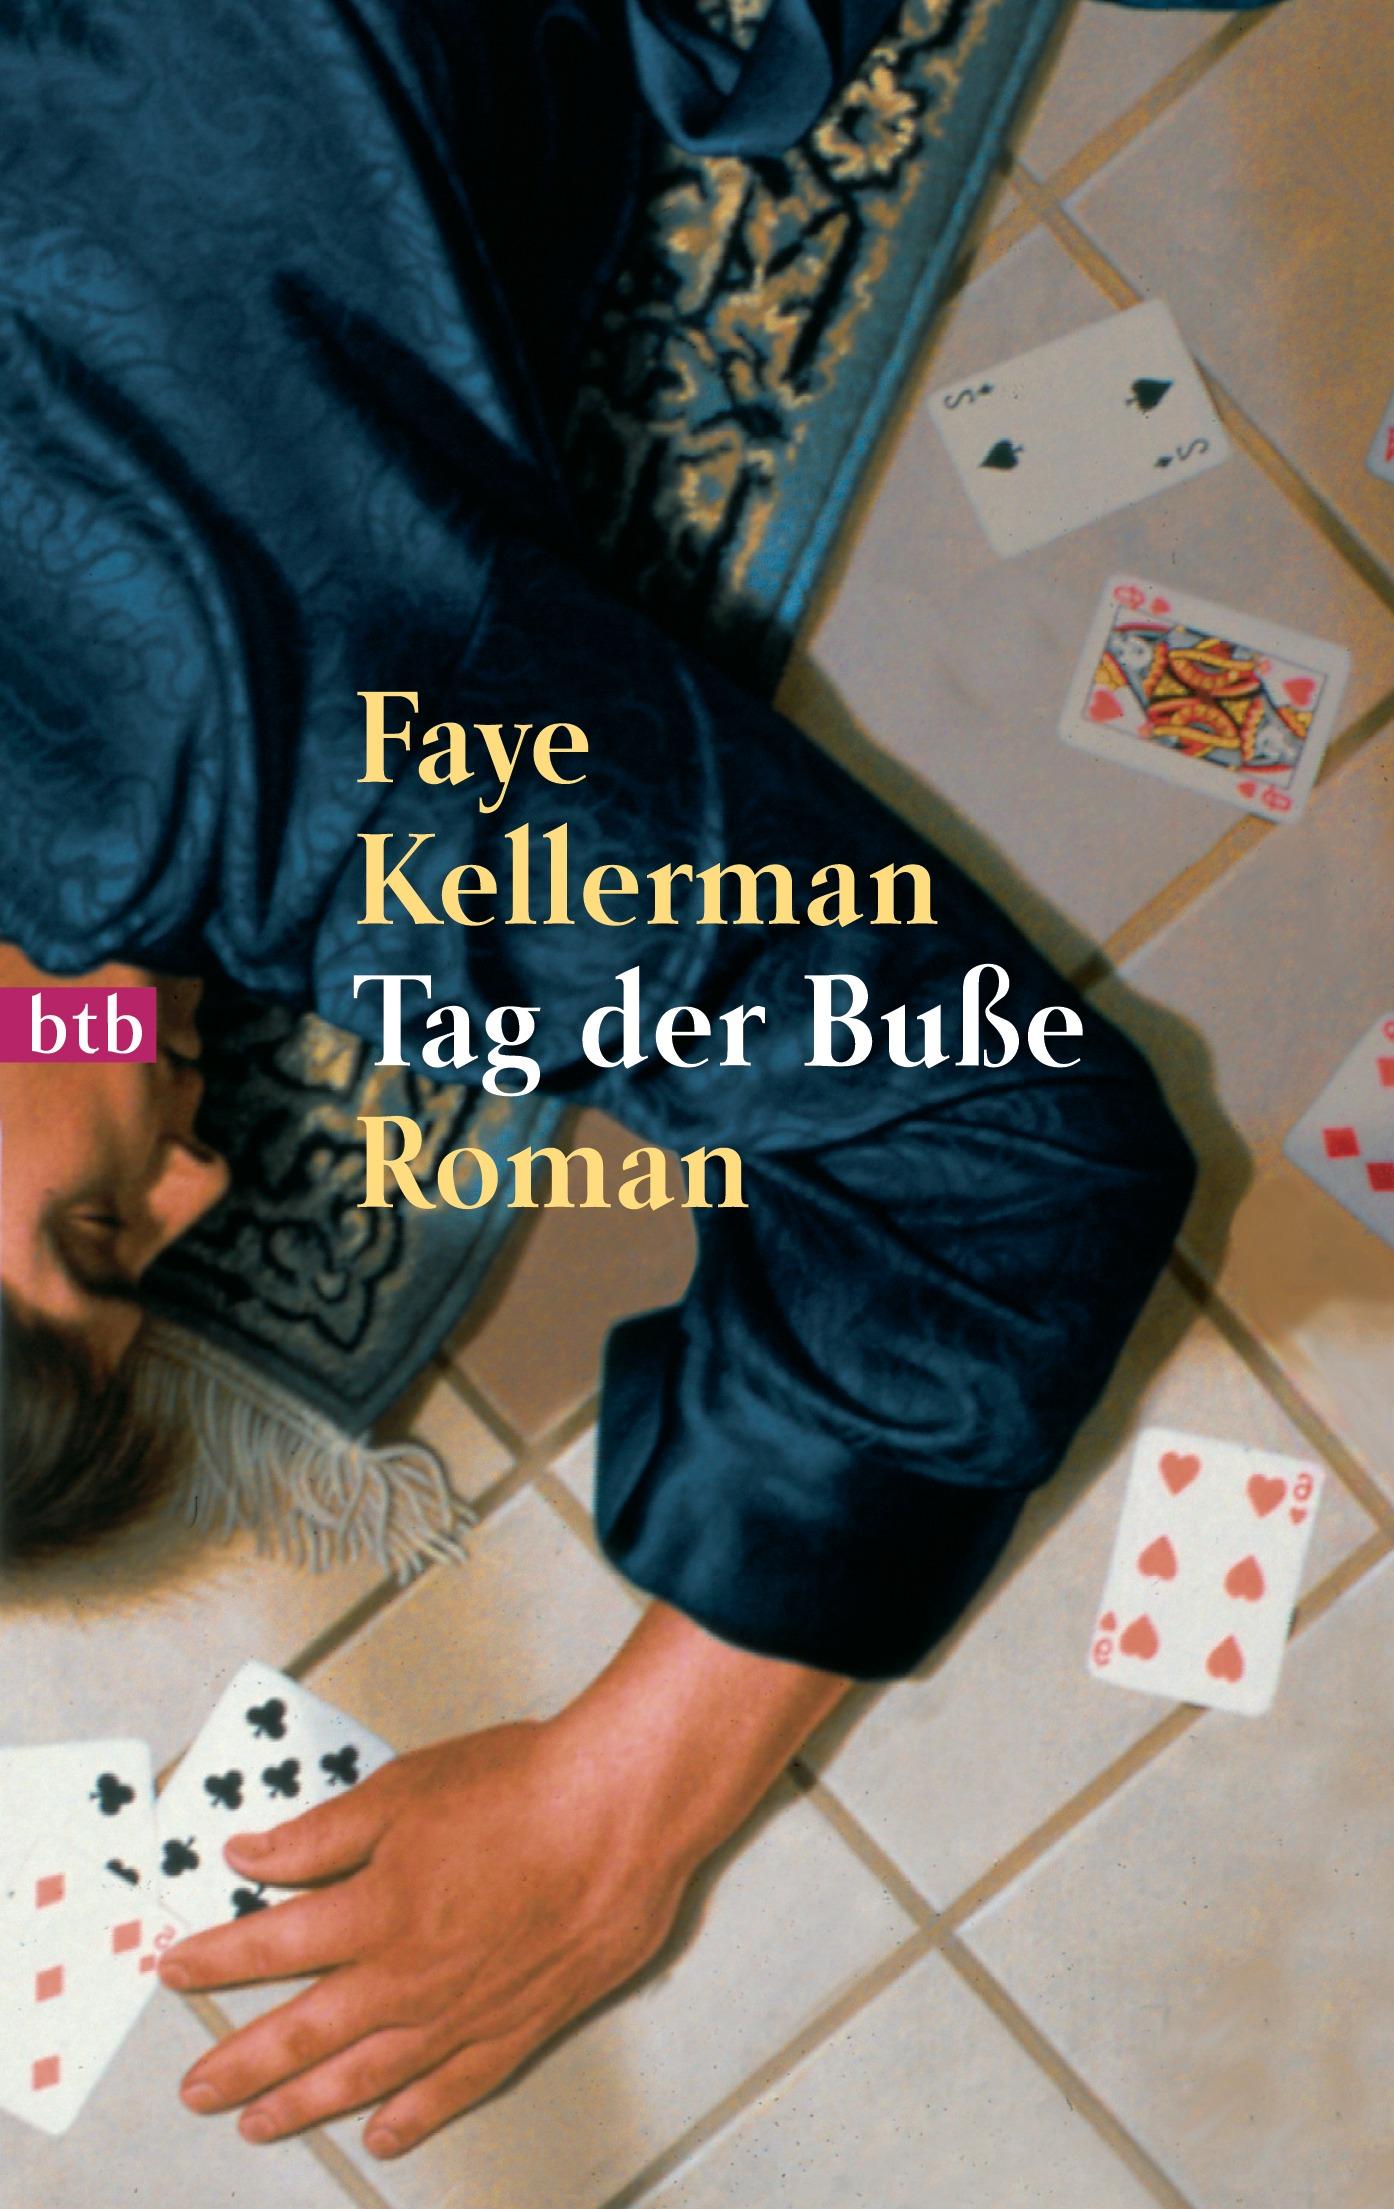 Tag der Buße - Faye Kellerman